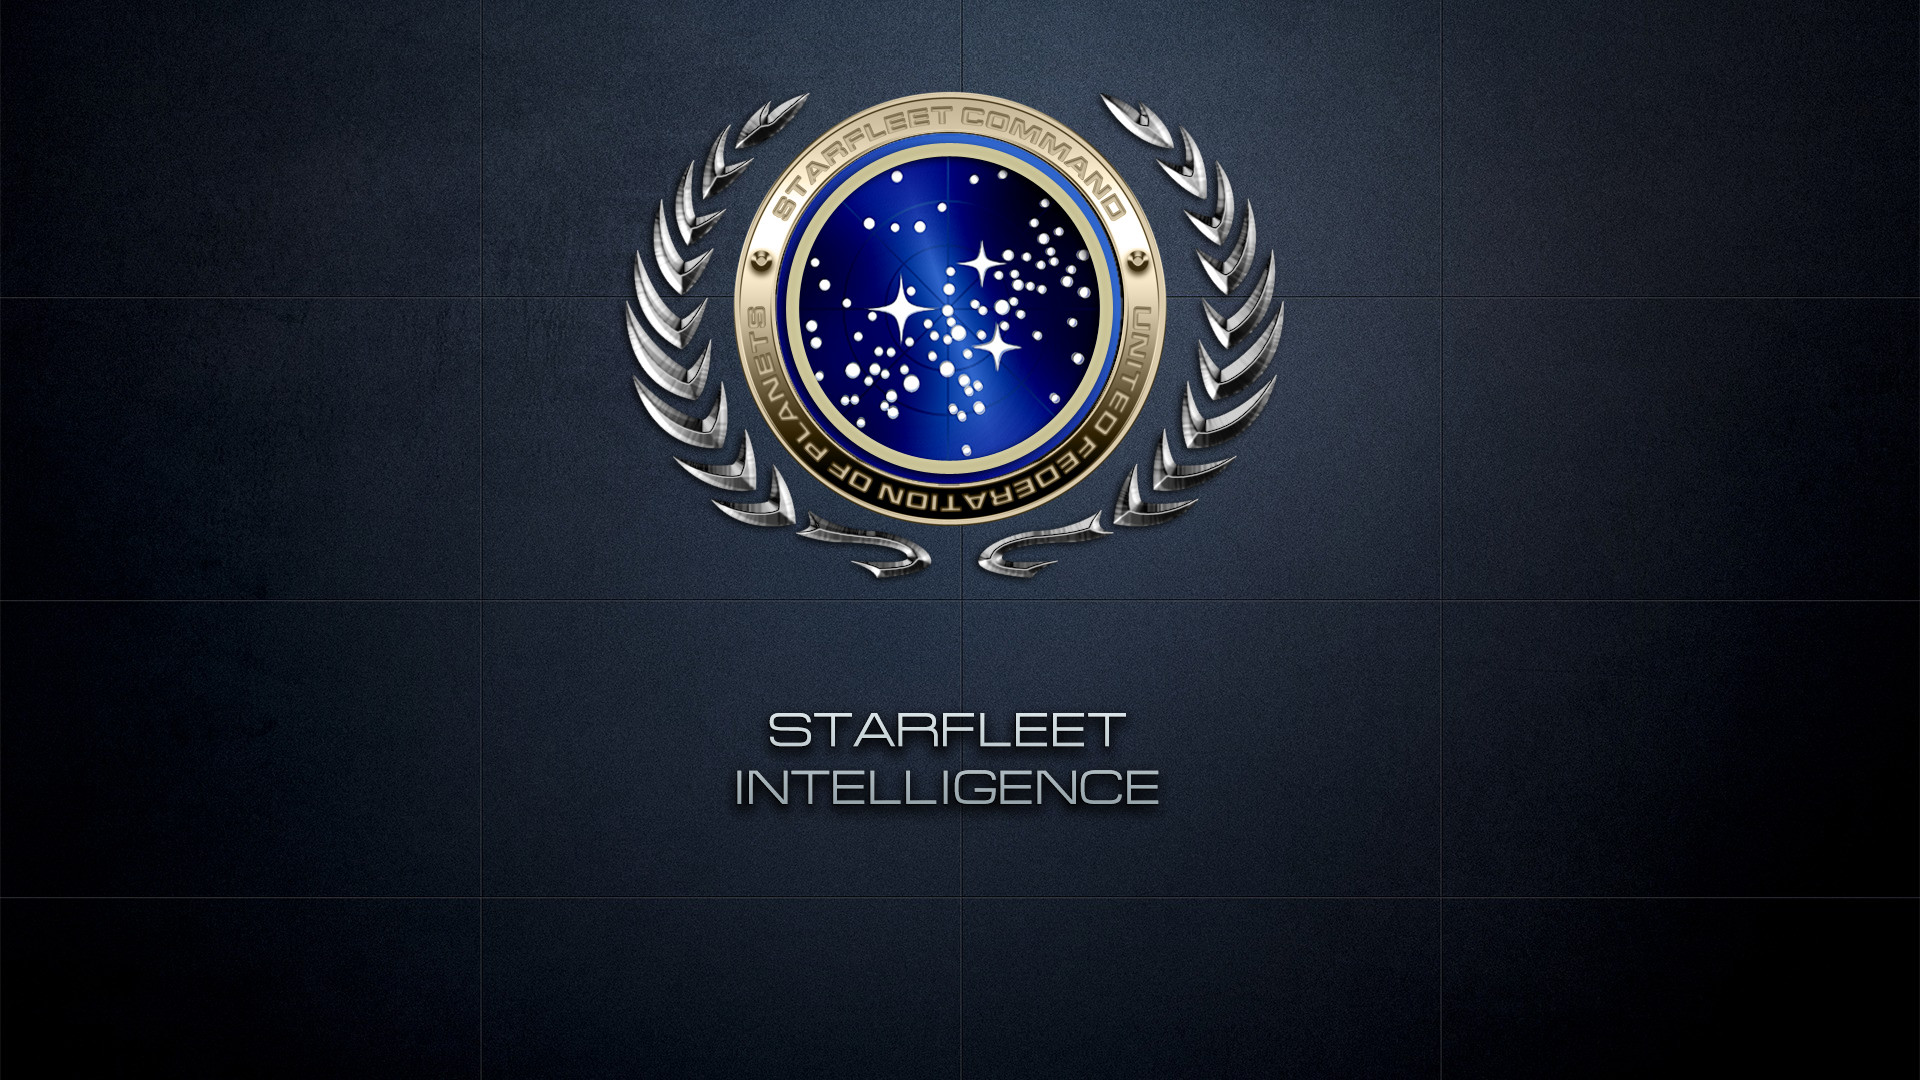 star trek starfleet command wallpaper - photo #18